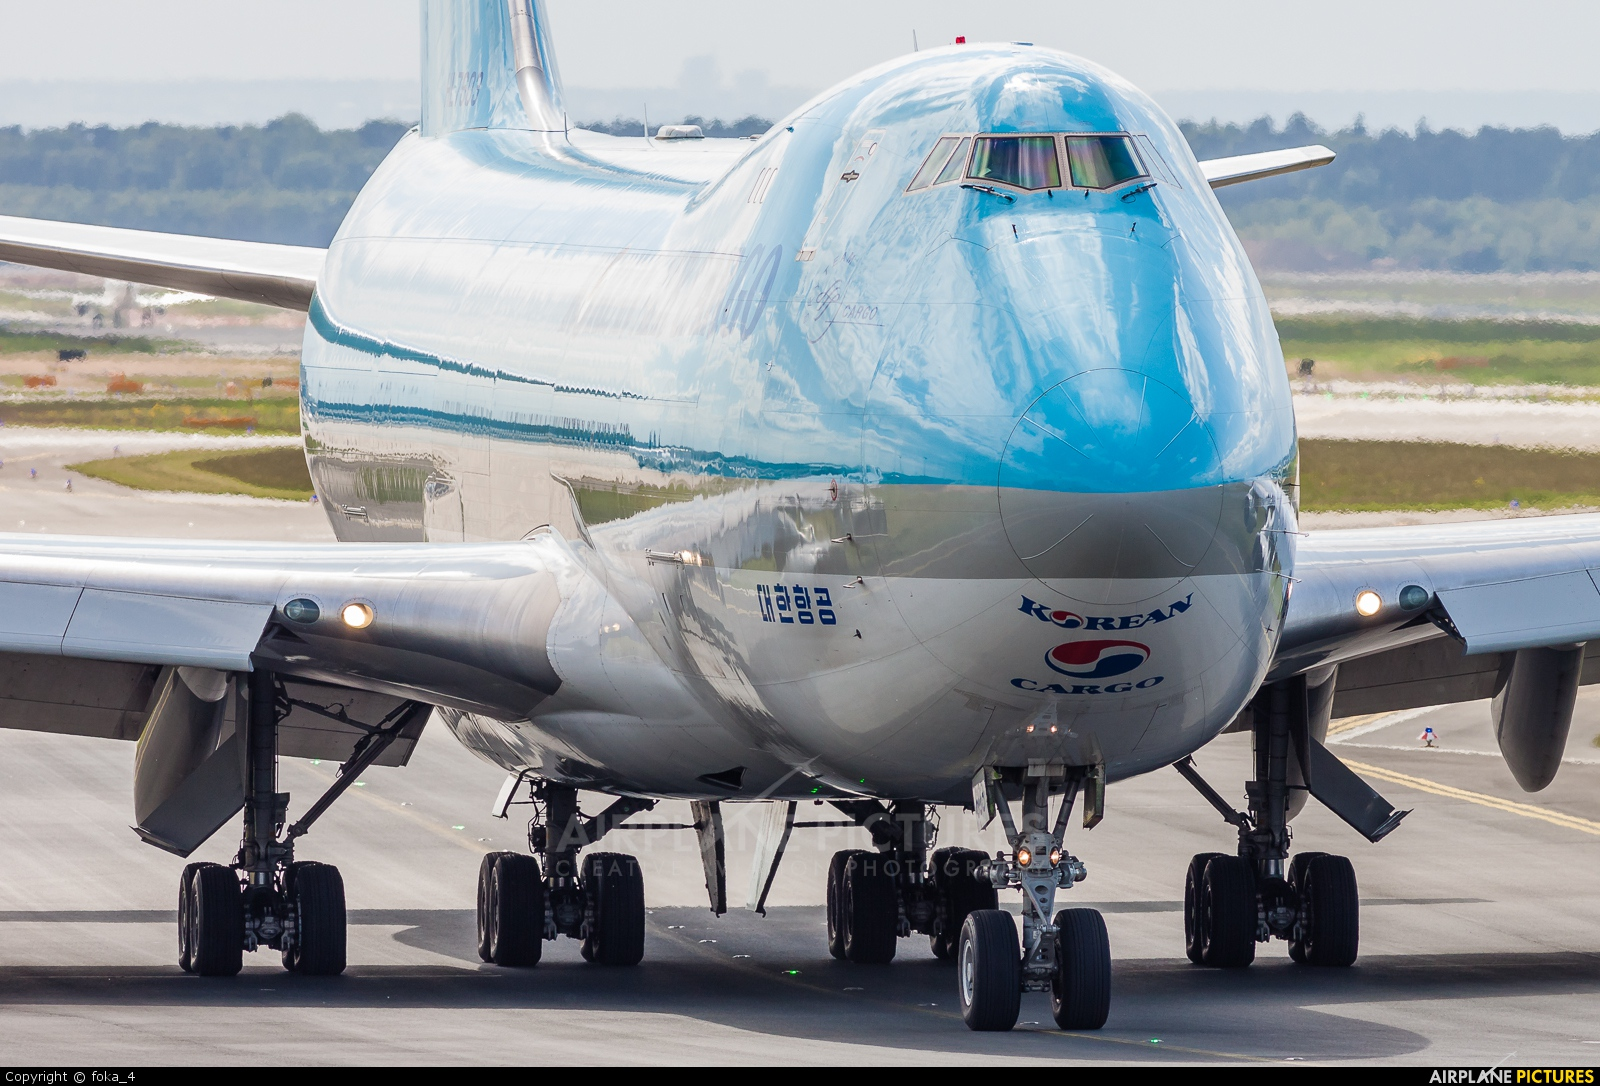 747 Plane Pictures Images amp Photos  Photobucket